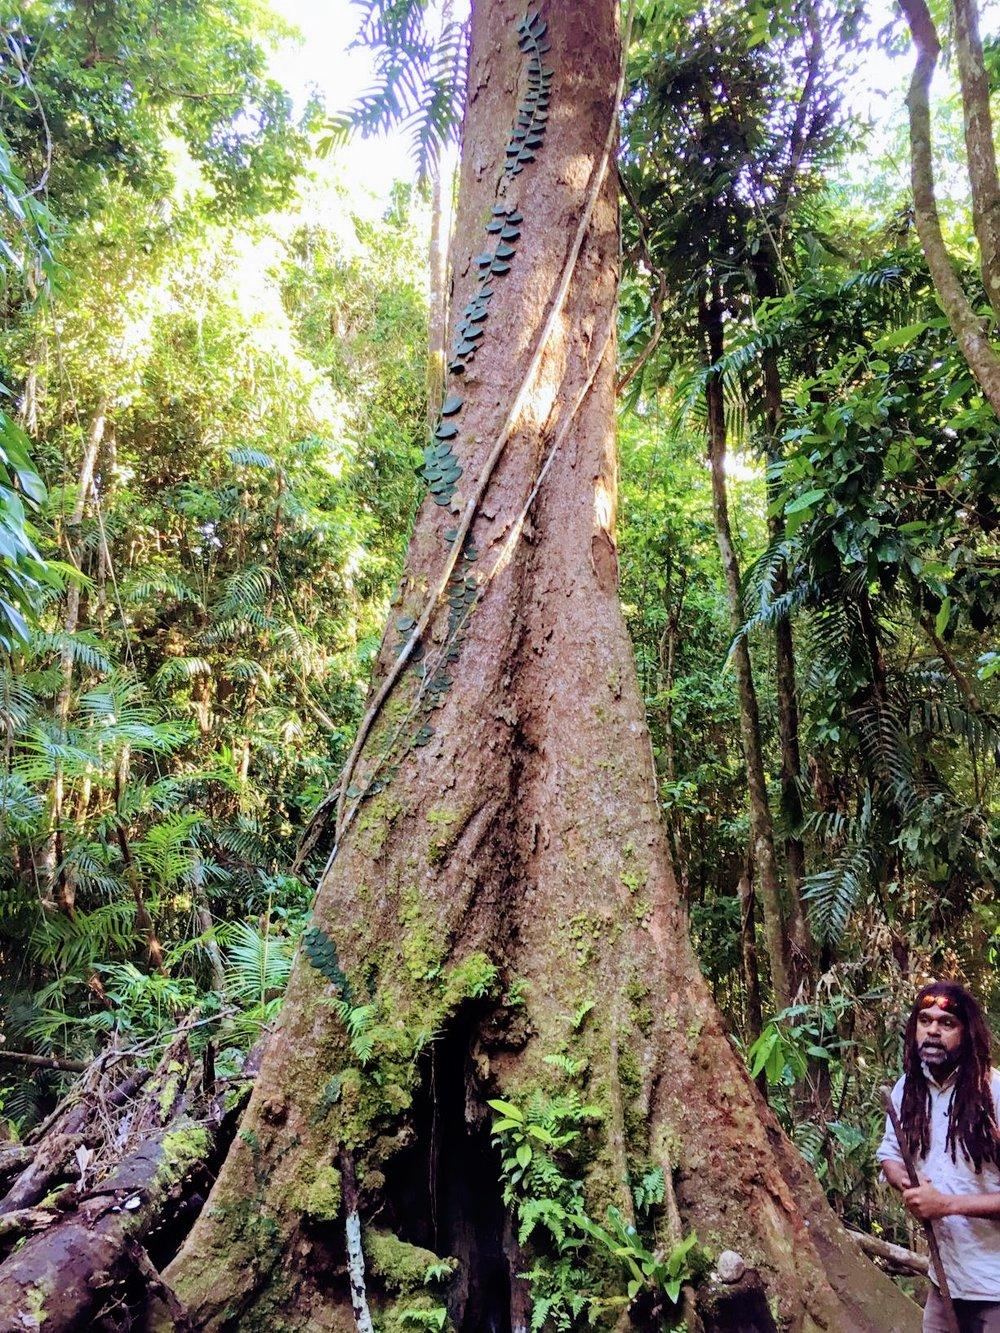 Moss Man Gorge near Port Douglas